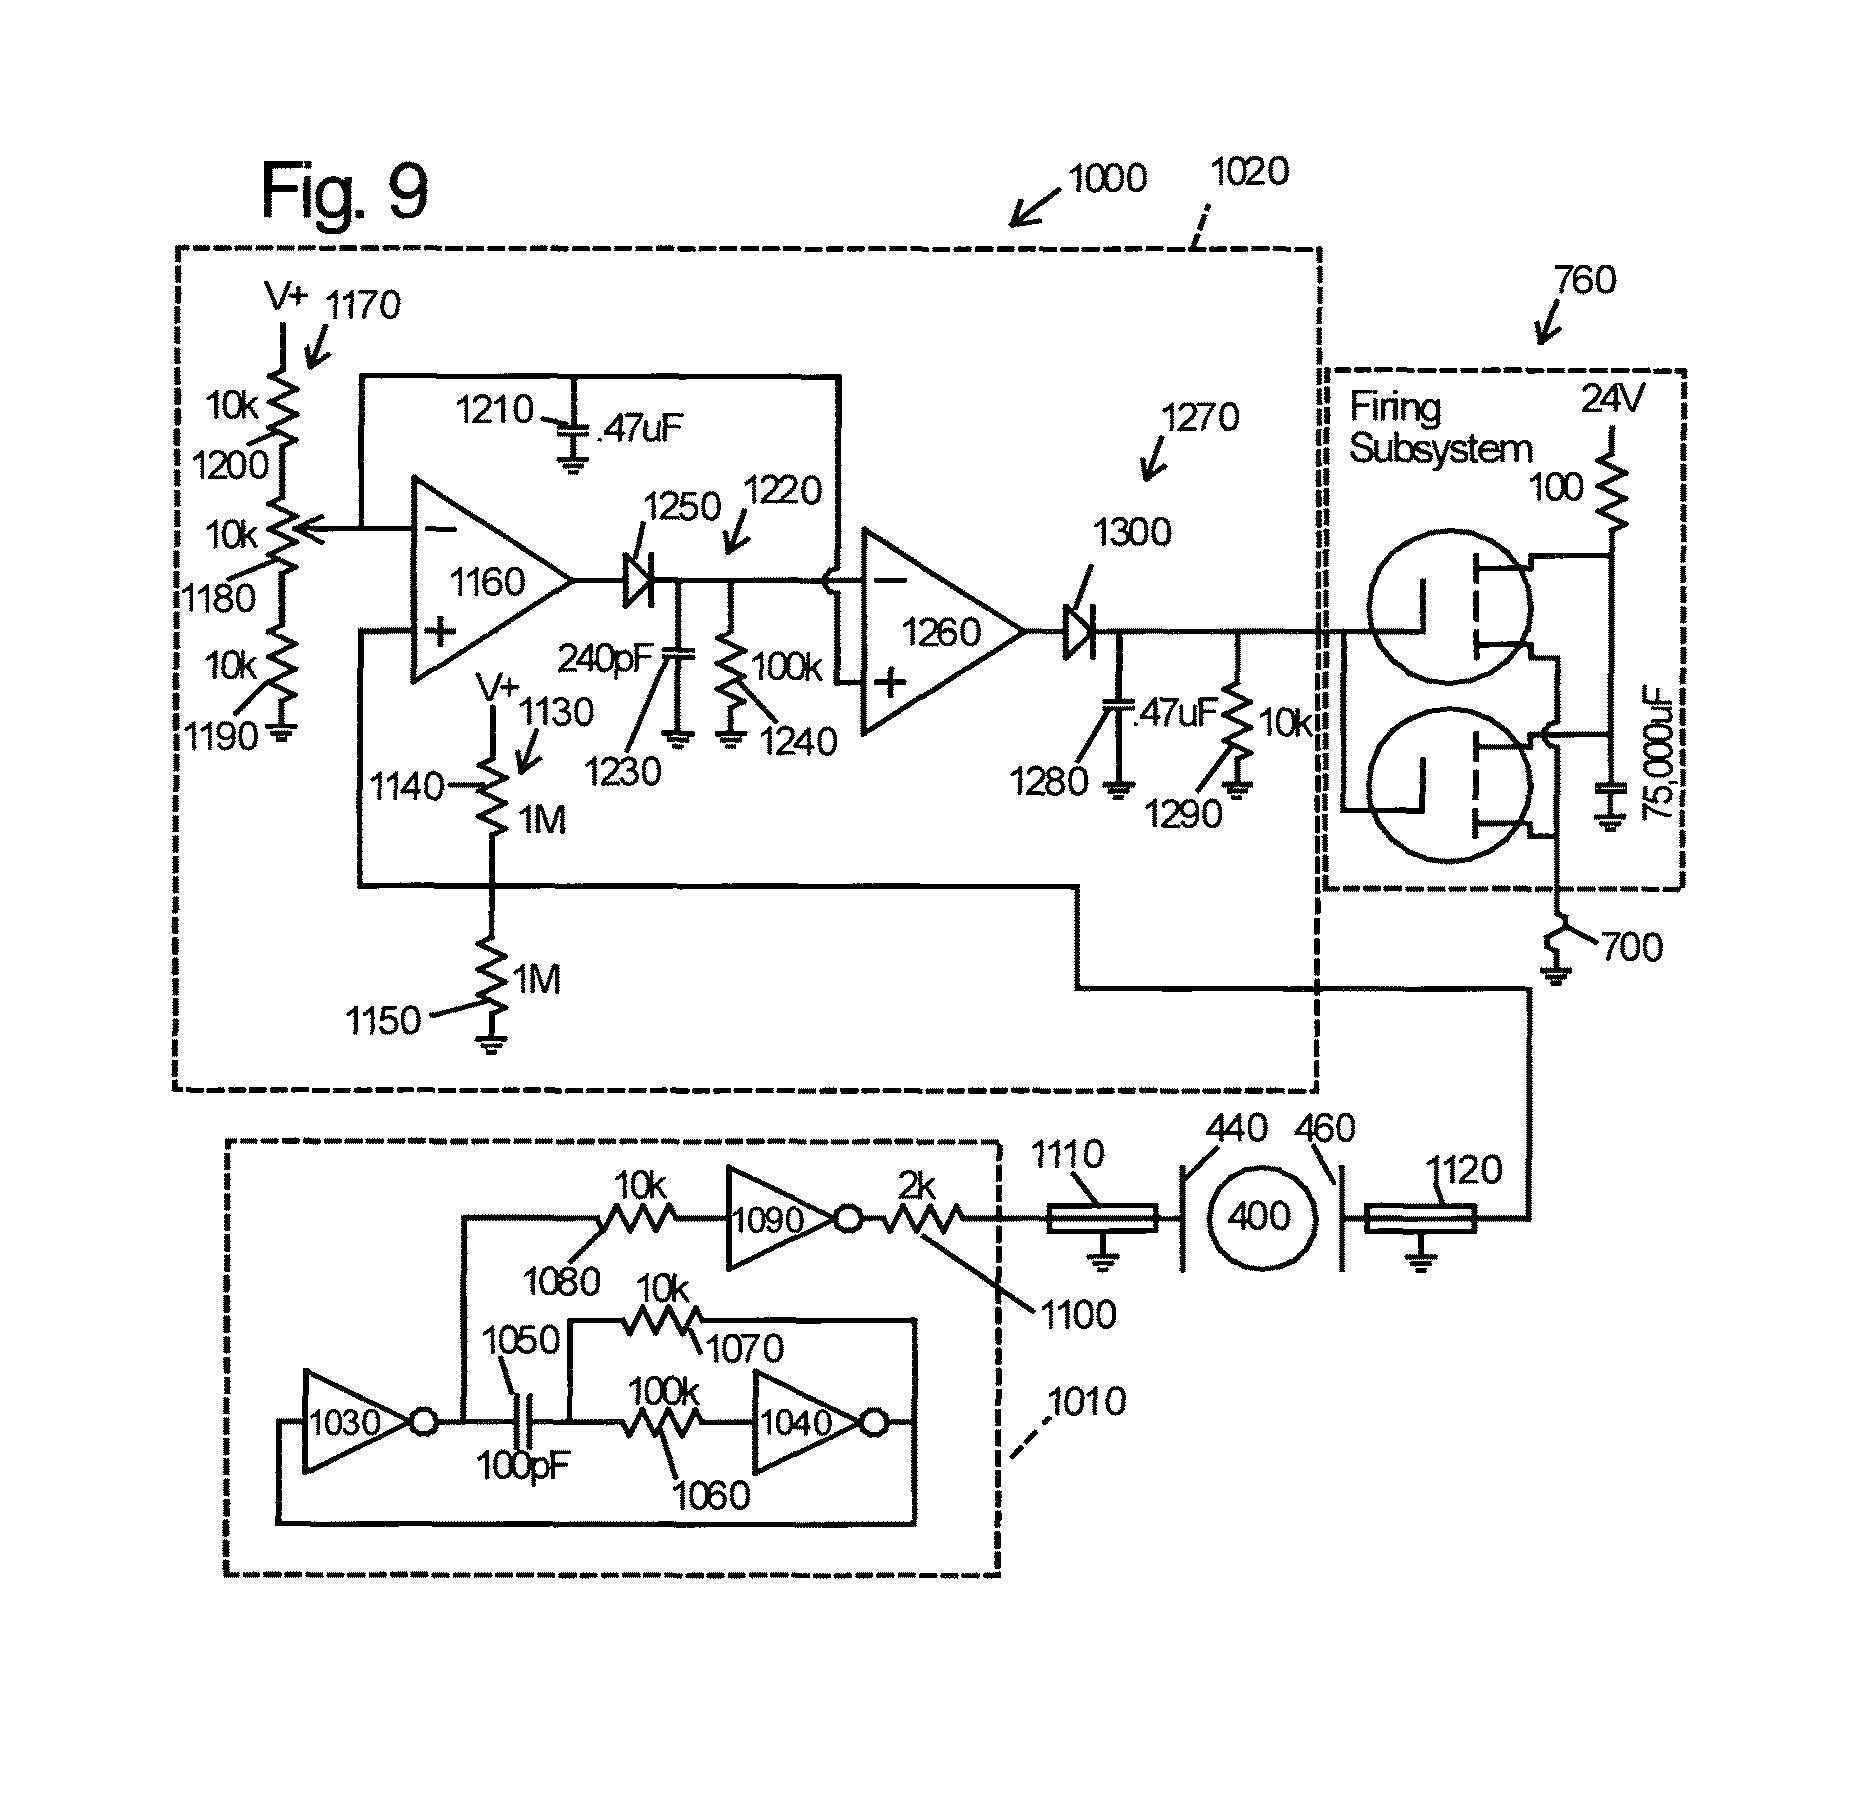 Late John Deere 12 Voltsl Wiring Diagram